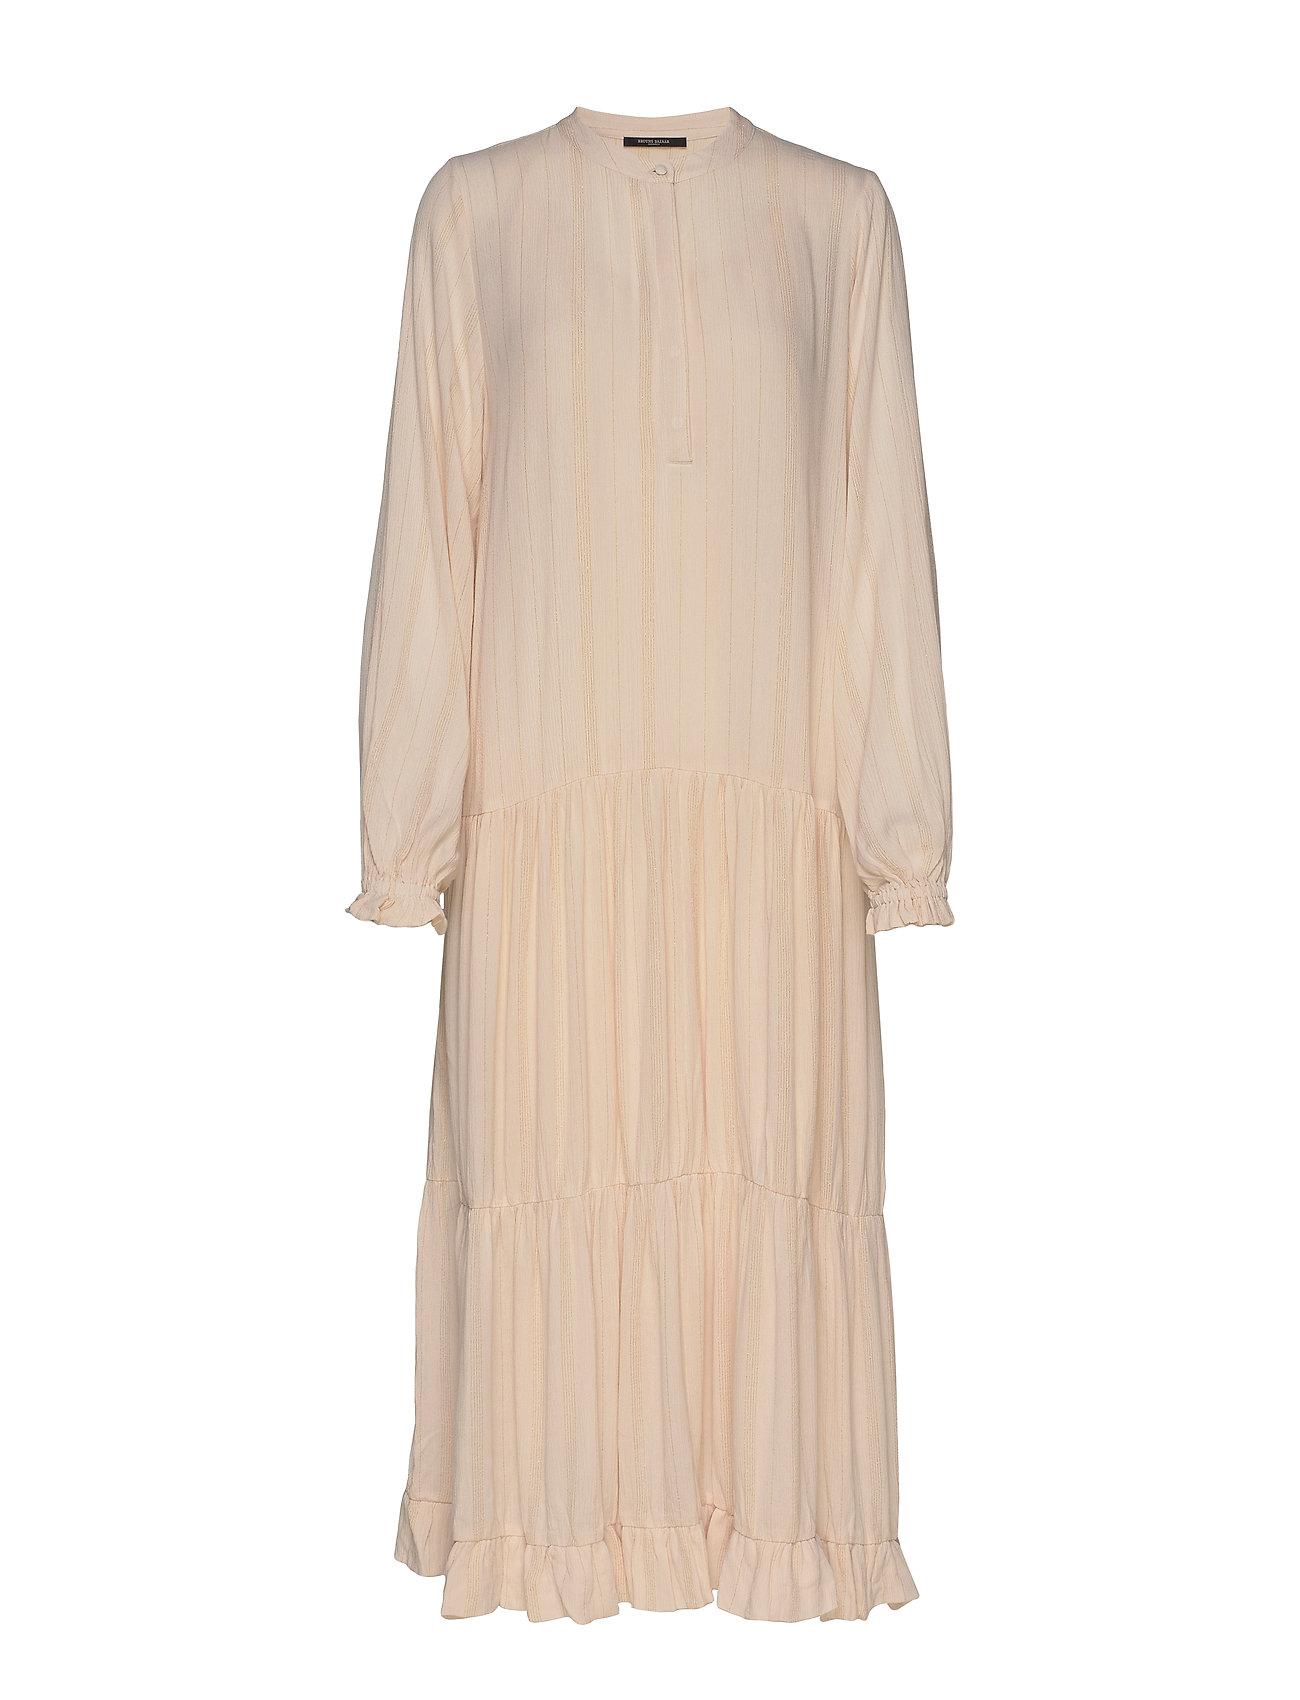 Bruuns Bazaar Nori Rosella dress BZ - SOFT ROSE